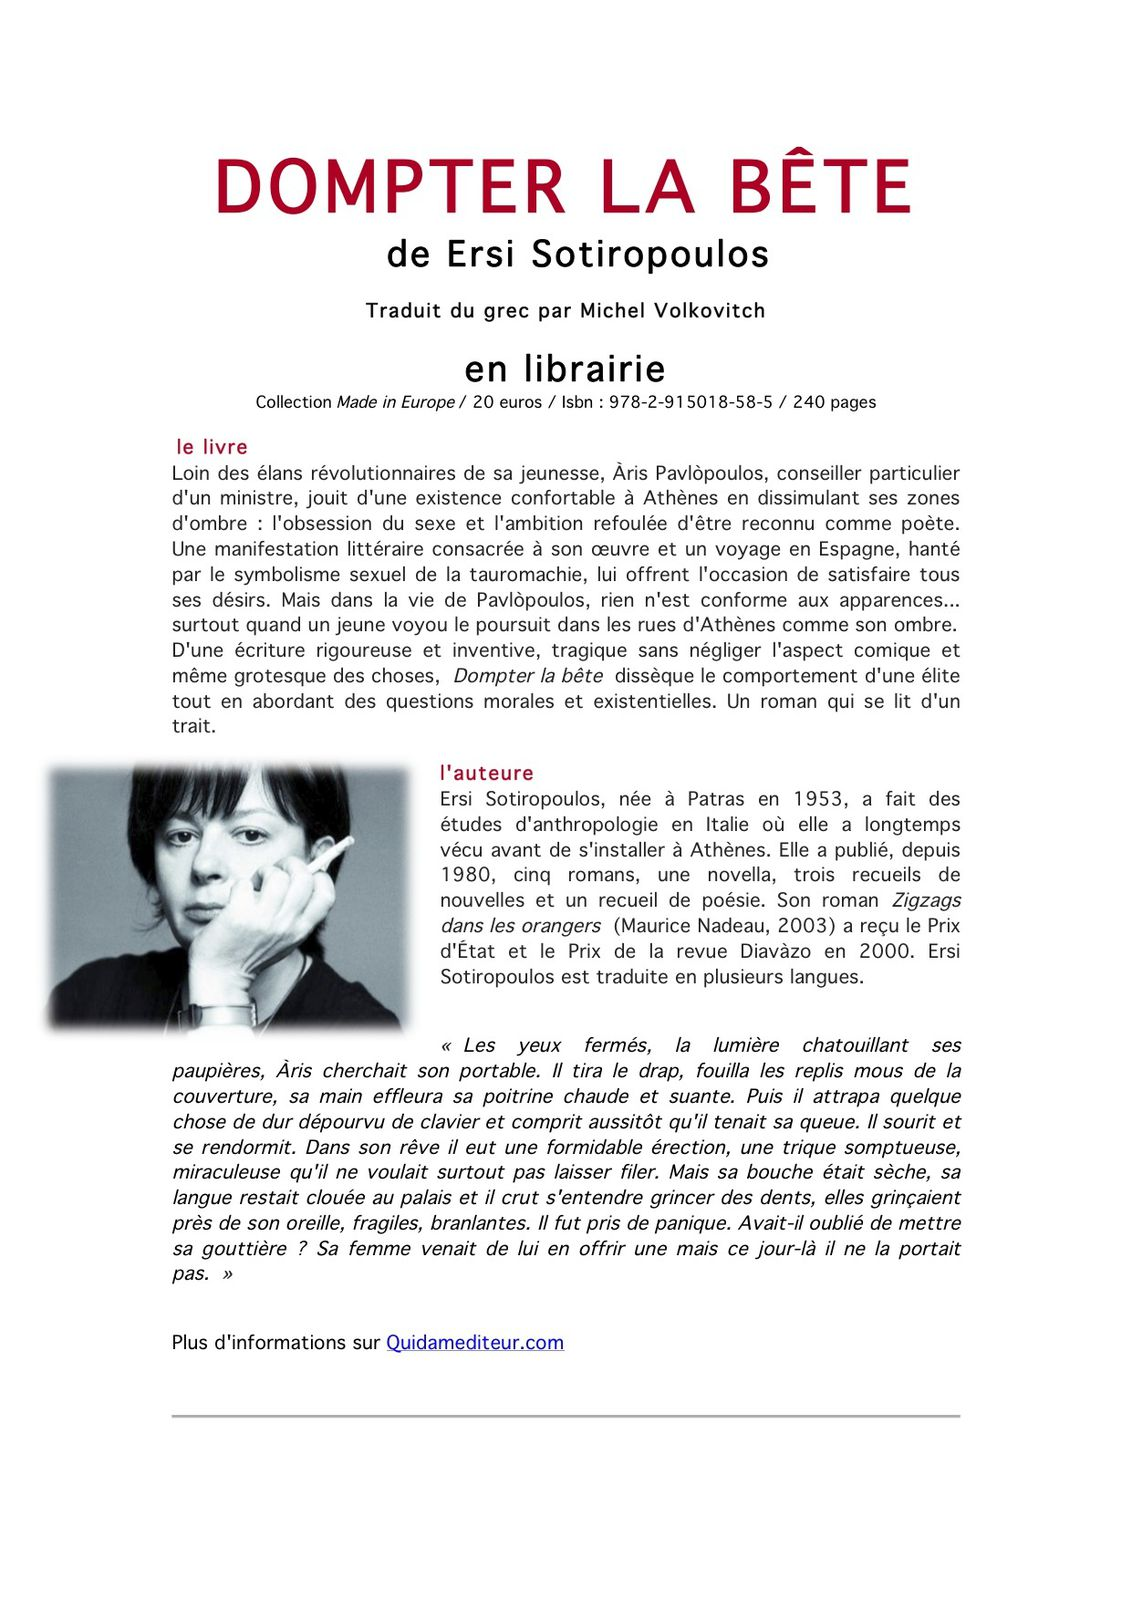 Ersi-Sotiropoulou-signature2.jpg